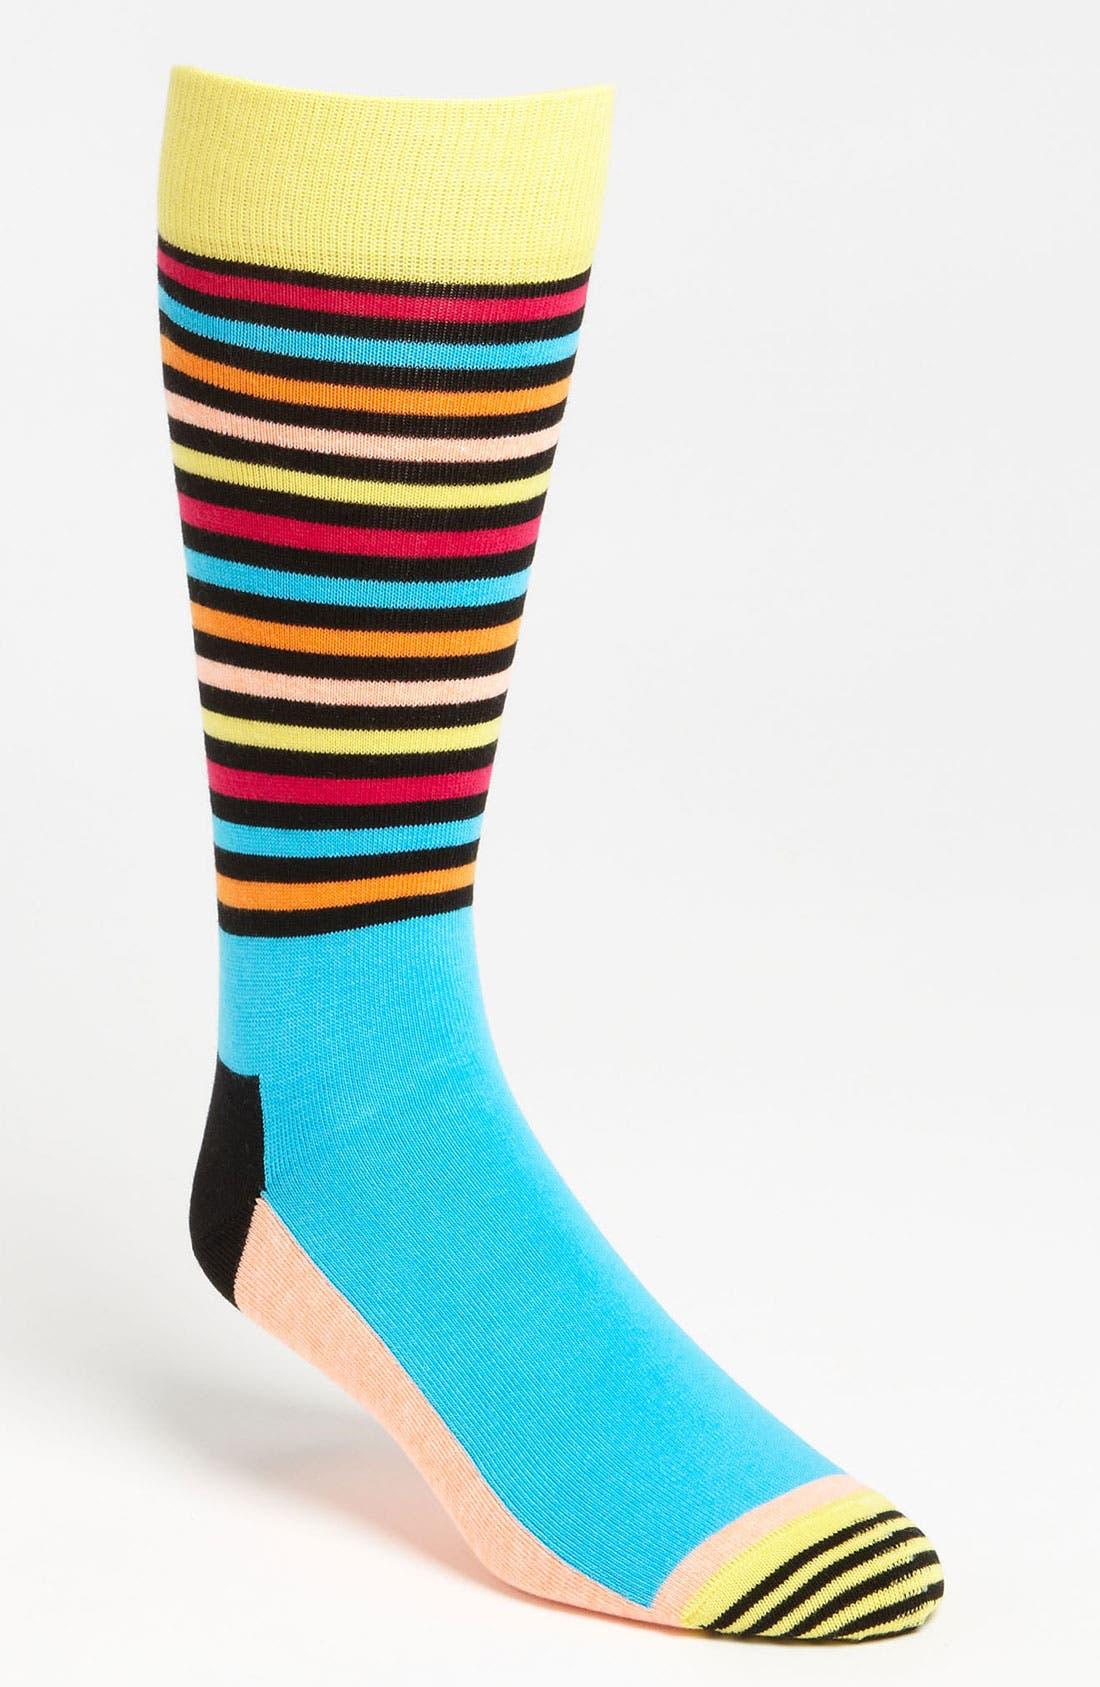 Main Image - Happy Socks Patterned Cotton Blend Socks